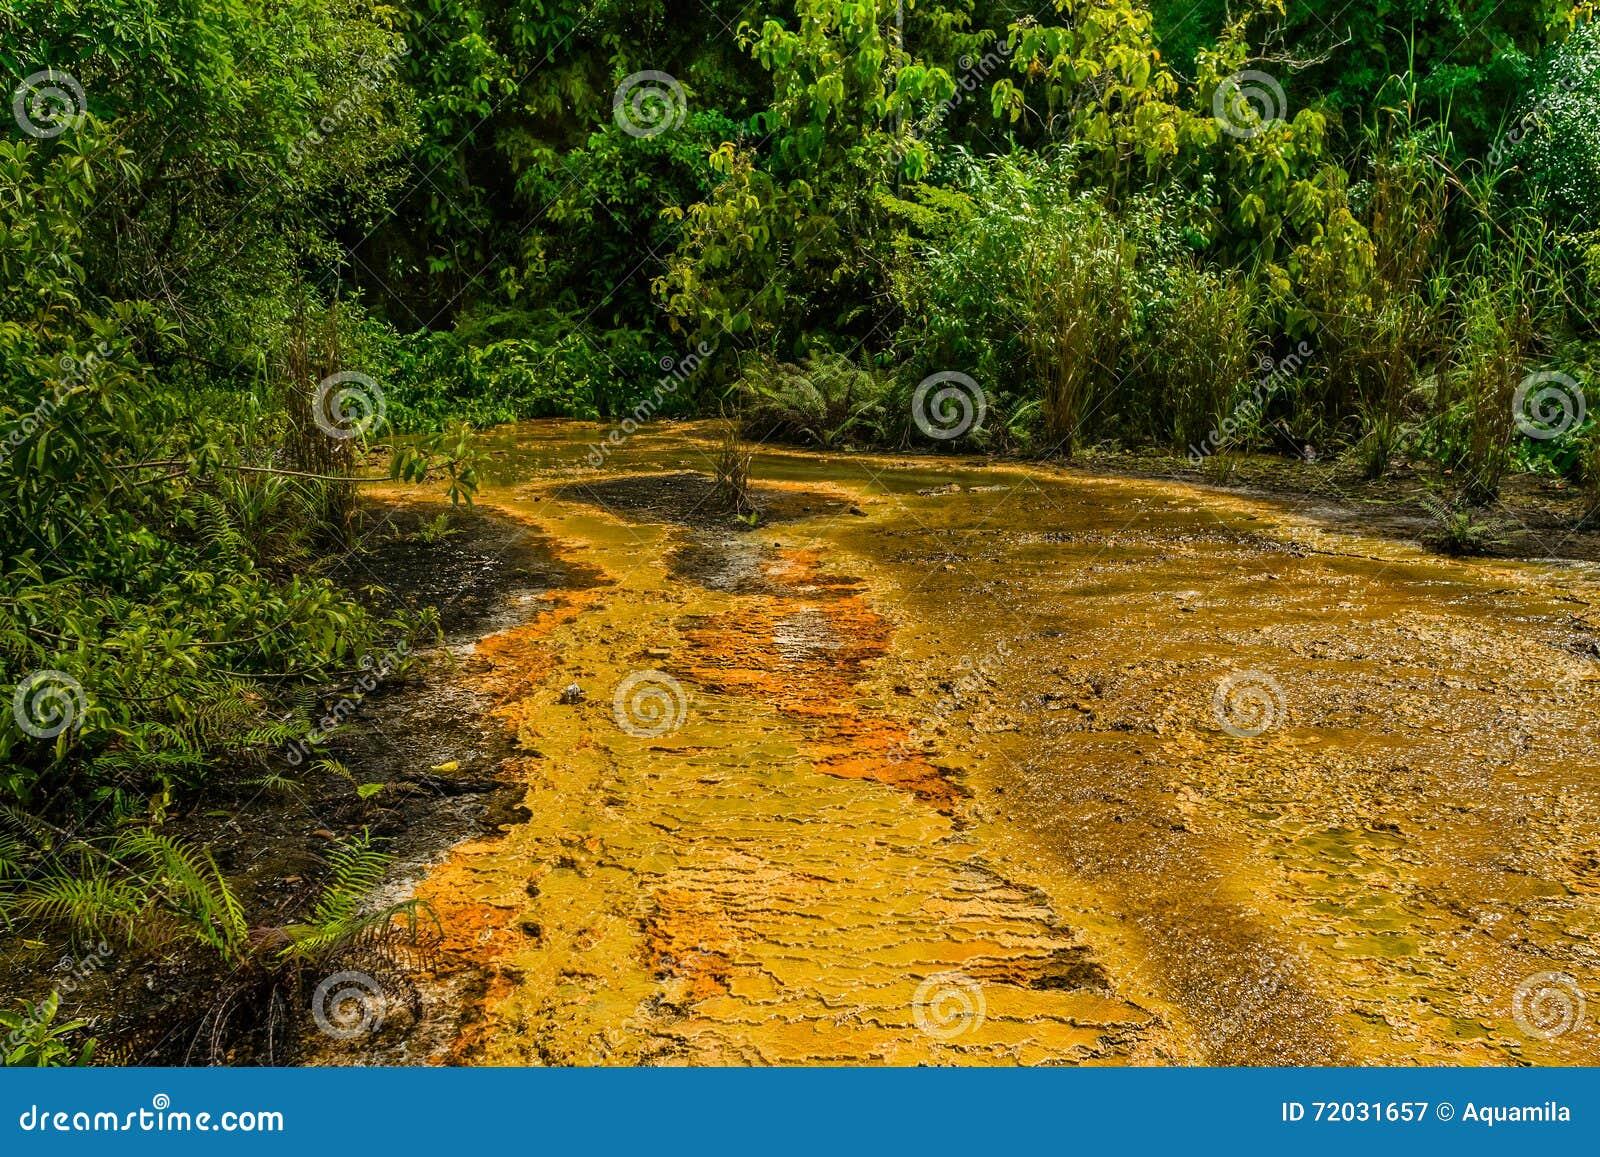 Khao Pra Bang Khram Wildlife Sanctuary, way to Emerald Pool aka Sa Morakot, tourist destination. Green tropical forest